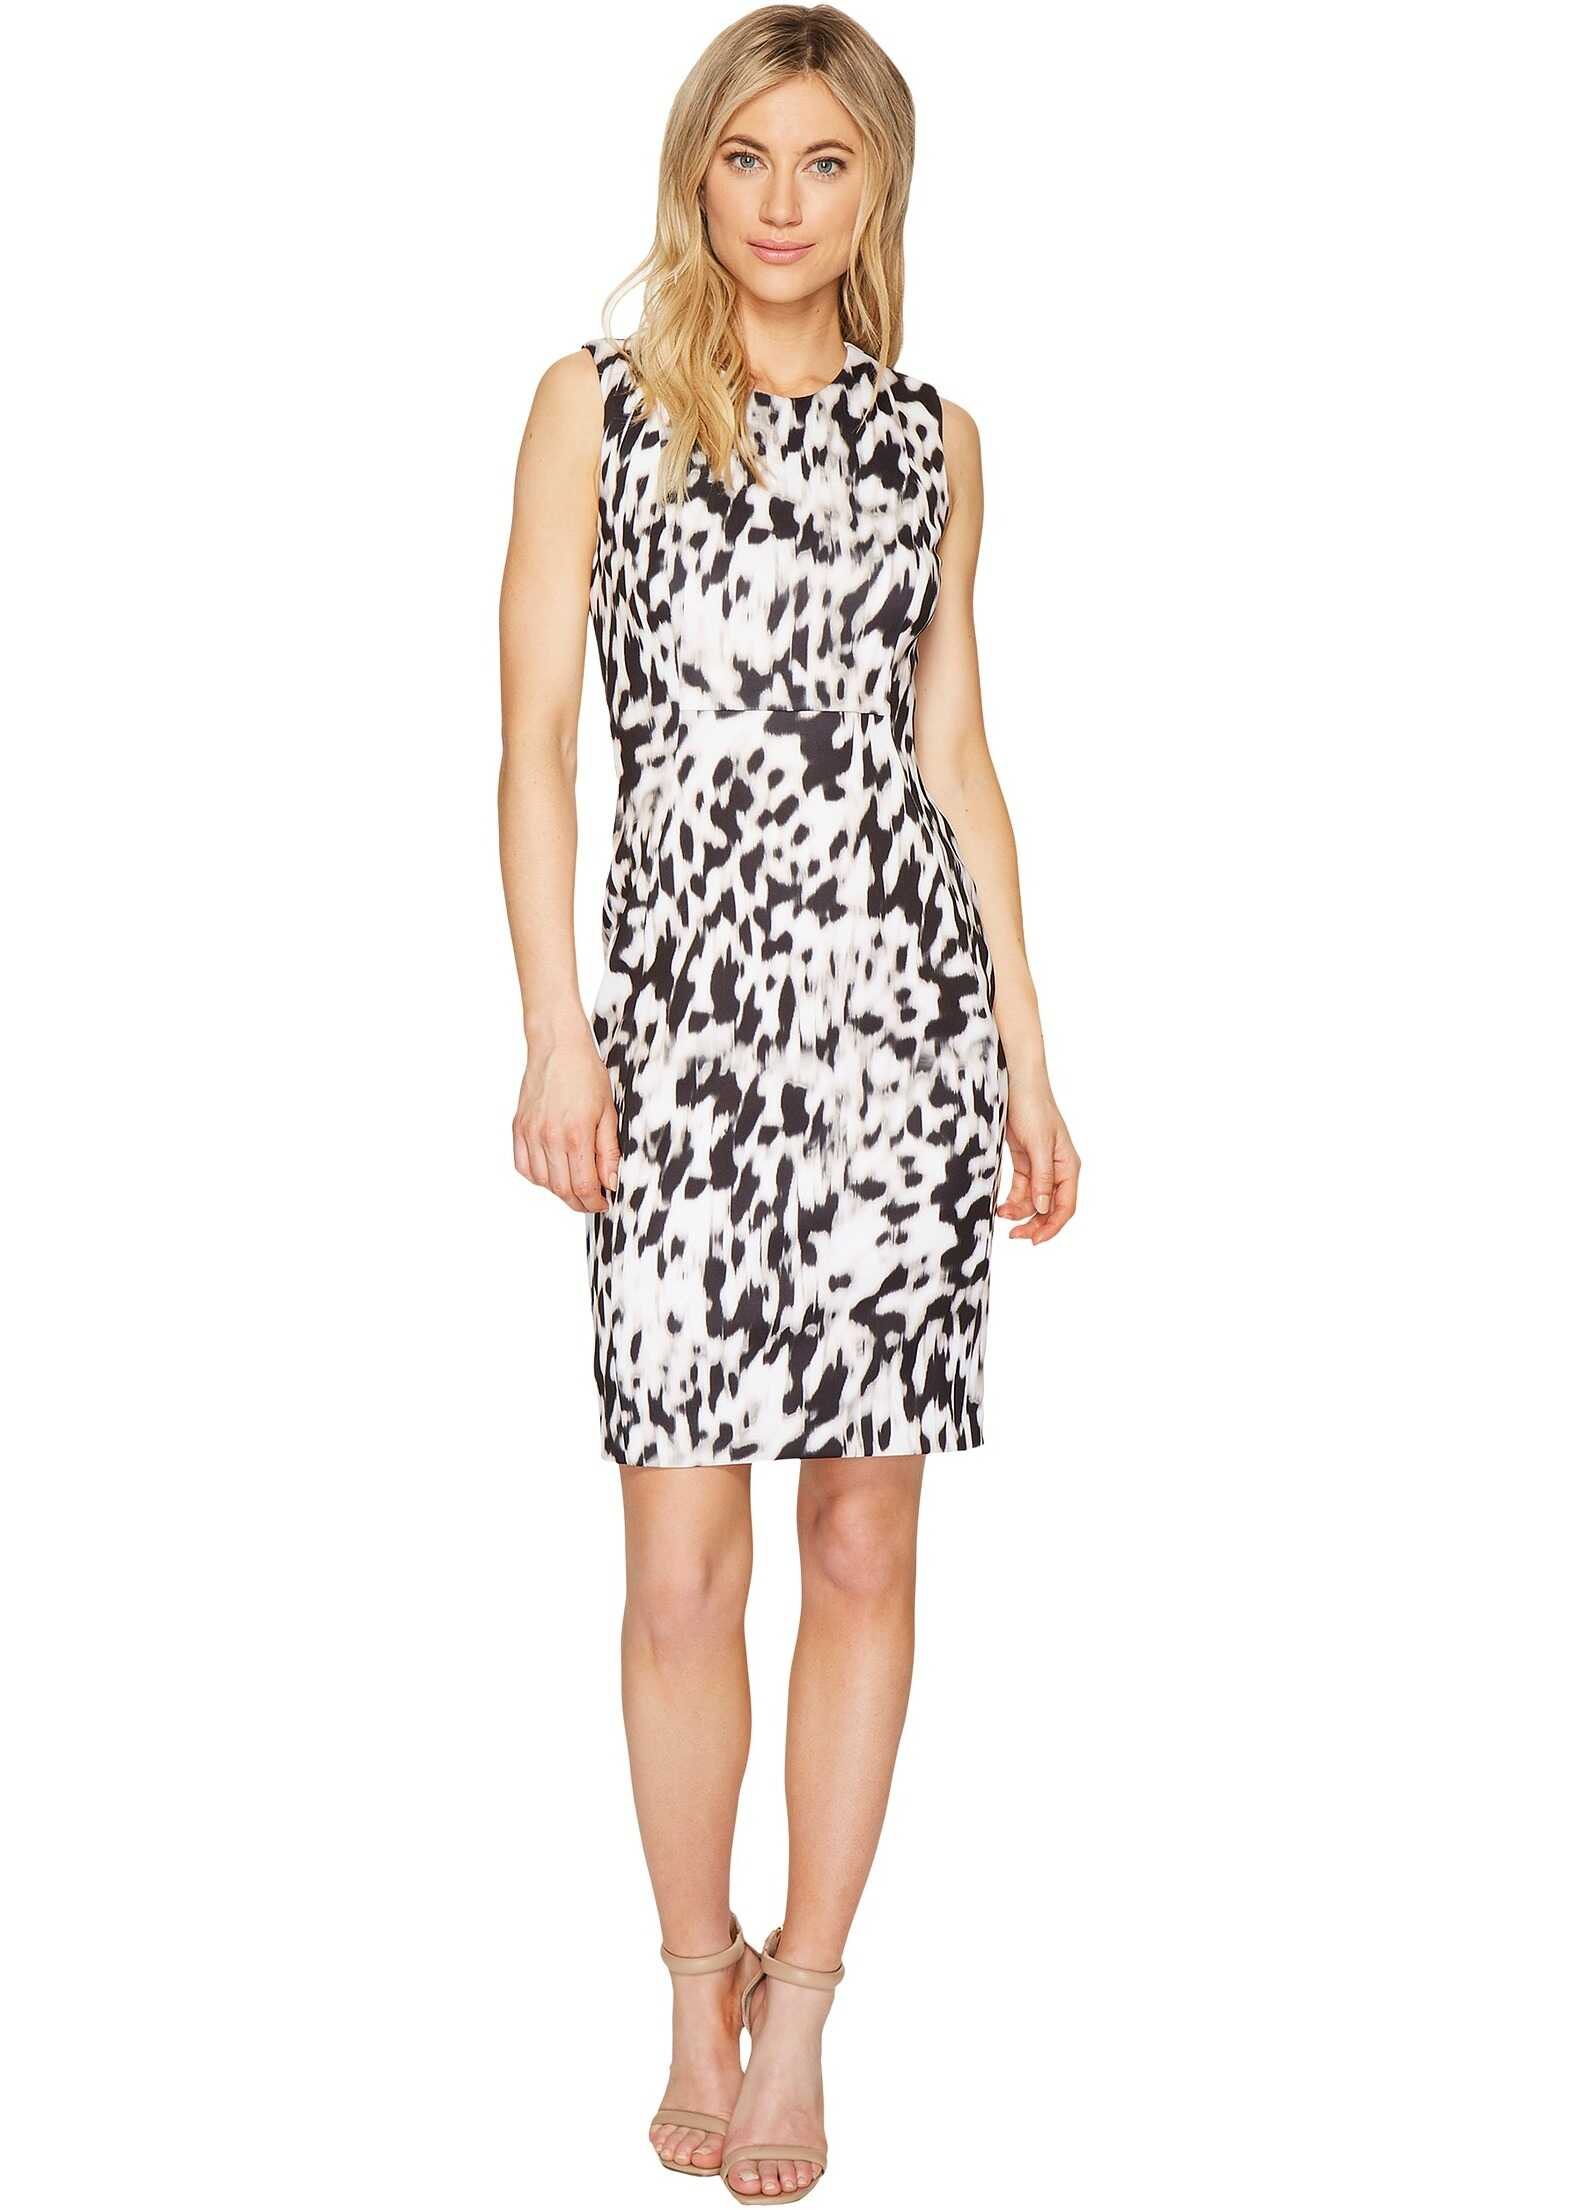 Calvin Klein Printed Sheath Dress Latte/Soft White Combo